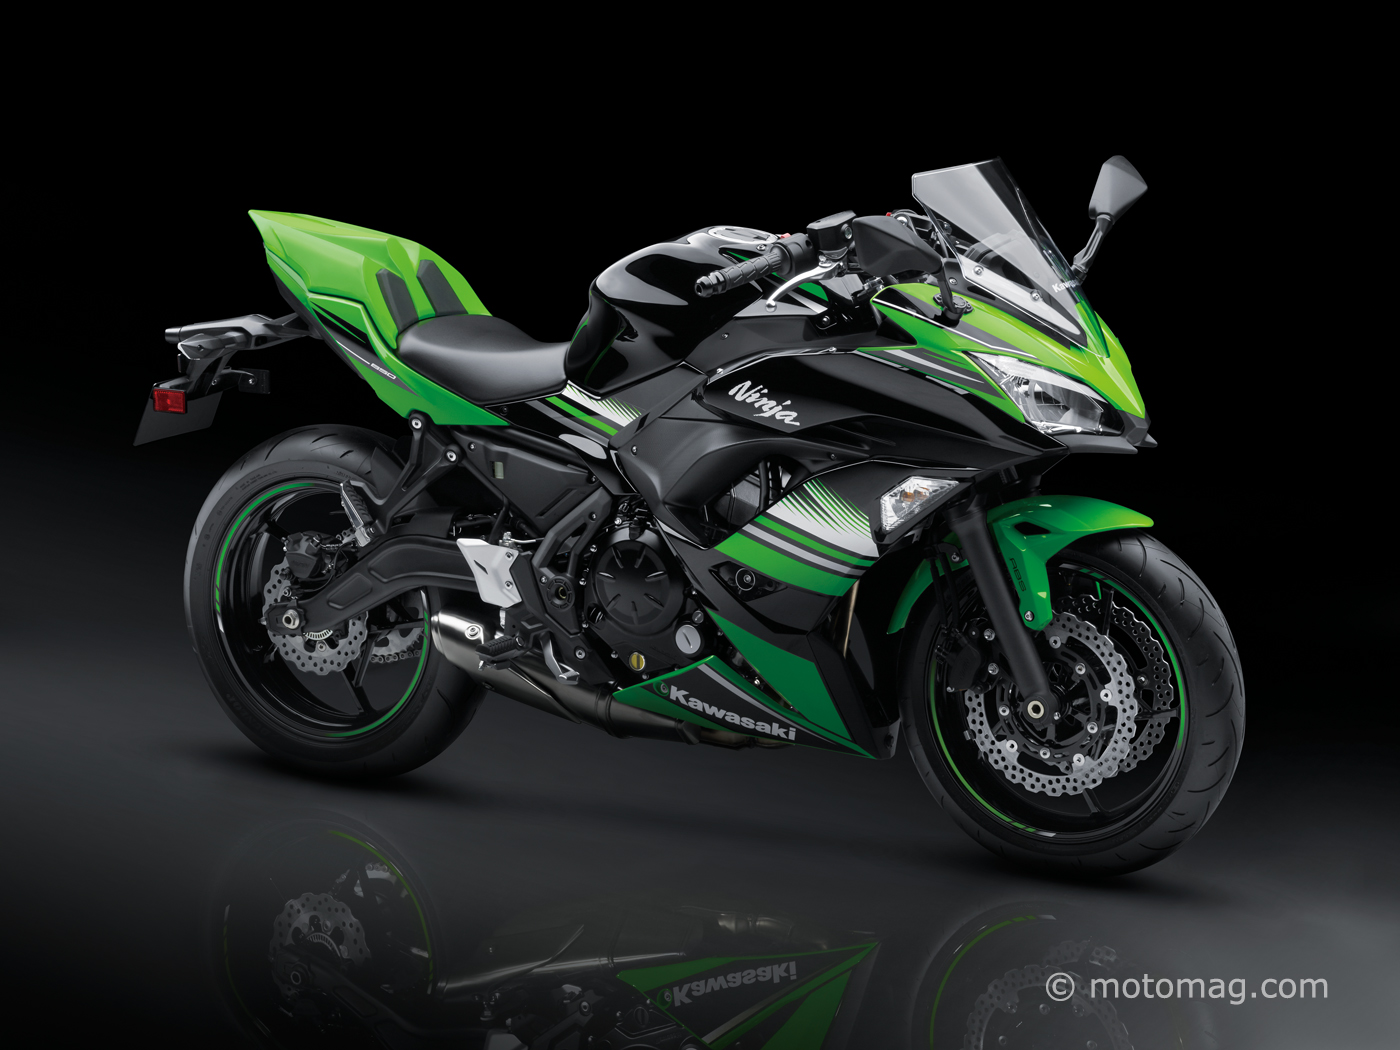 Nouveauté Kawasaki 2017 : La Séduisante Ninja 650